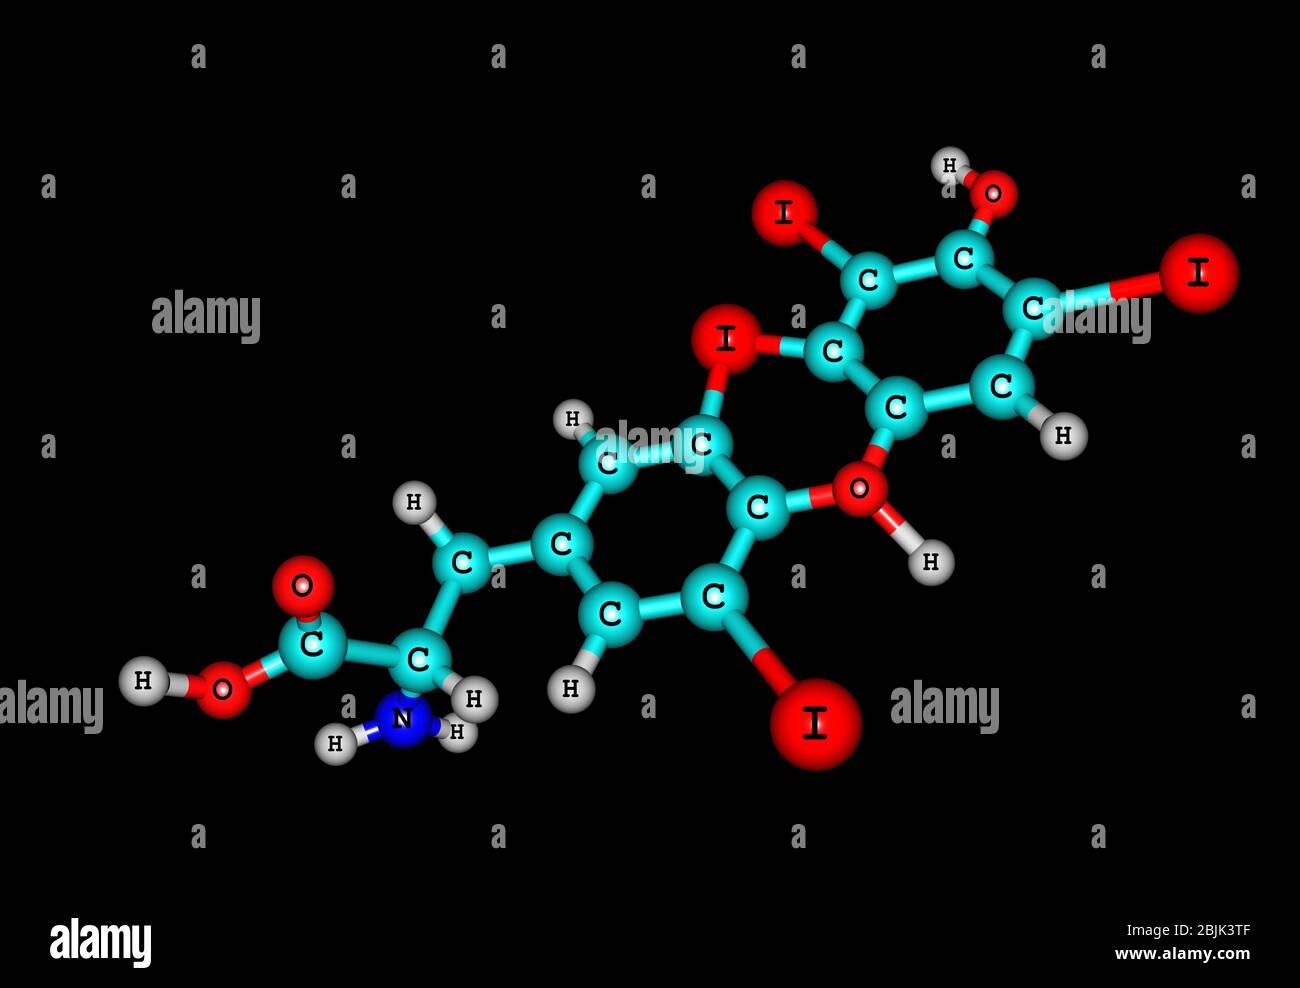 The Thyroid Hormones T3 And Thyroxine T4 Are Tyrosine Based